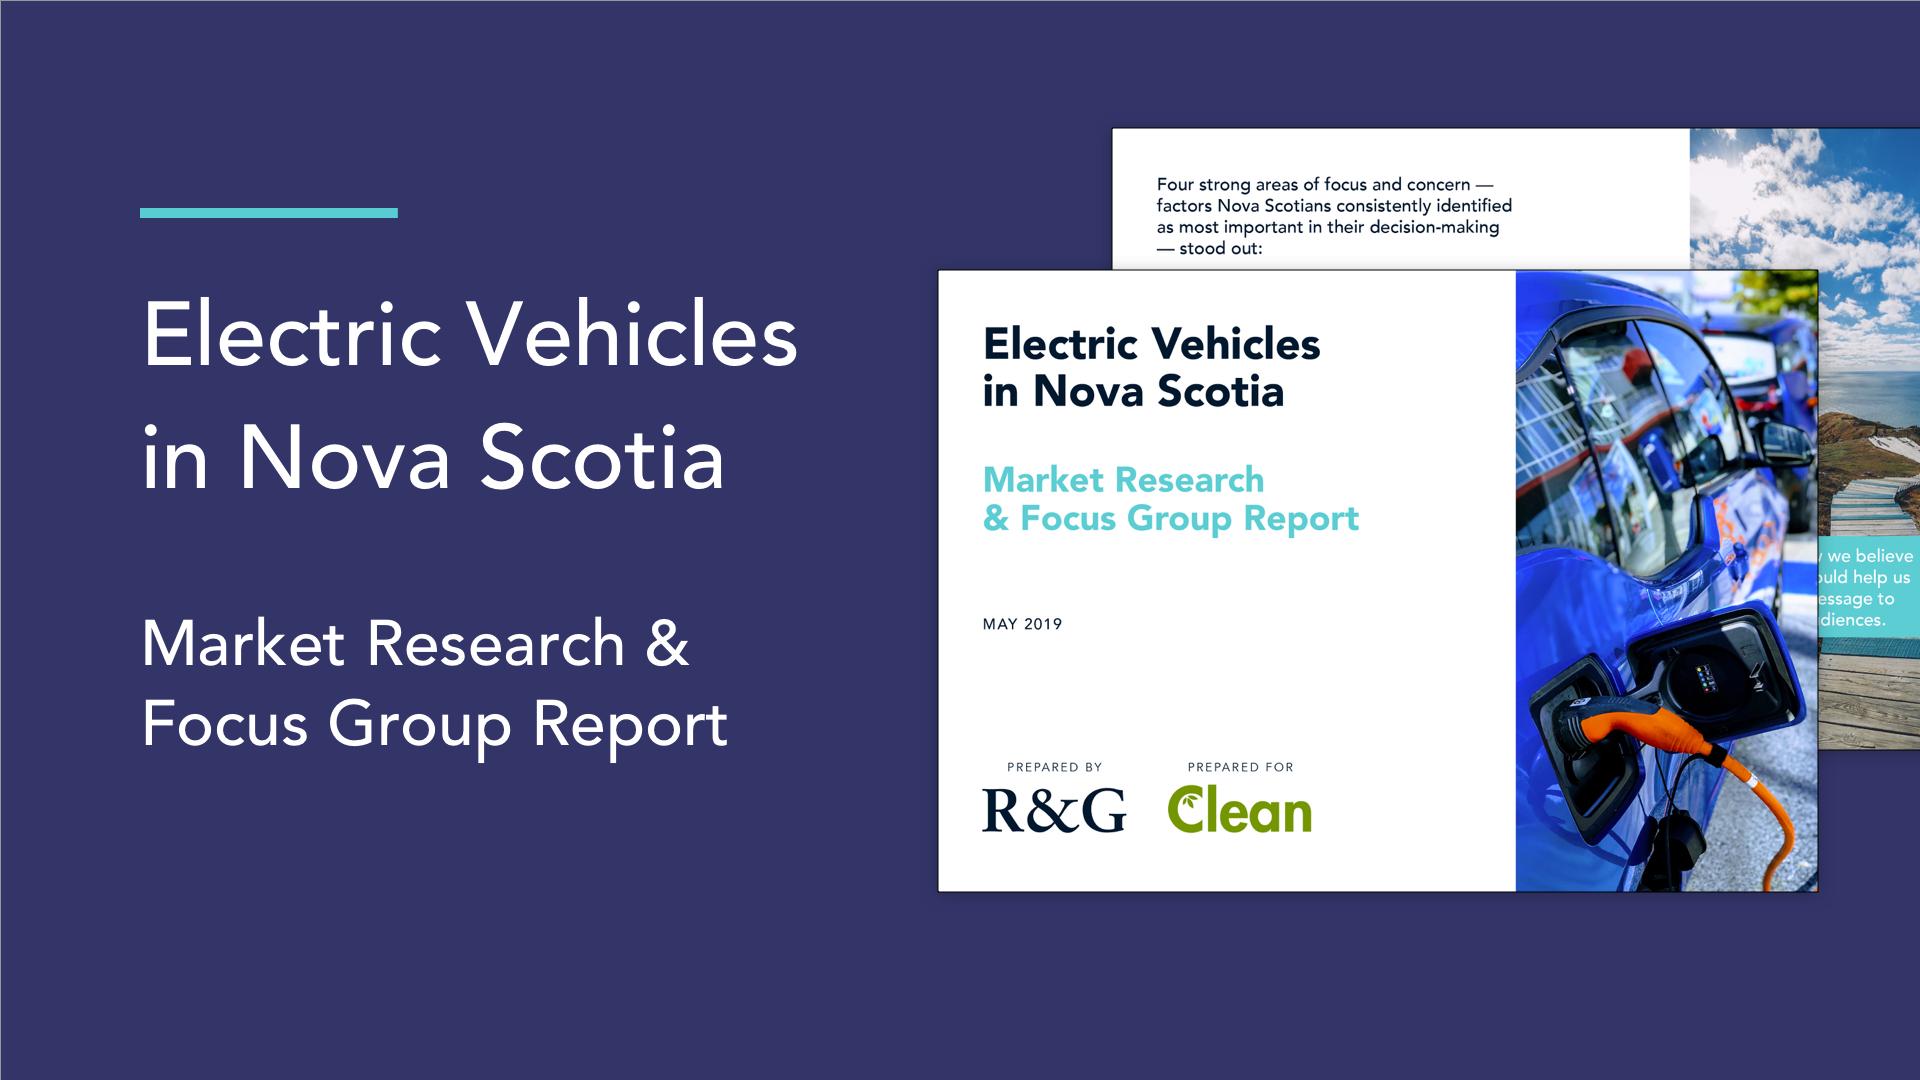 EVs in Nova Scotia - Market Research & Focus Group Report